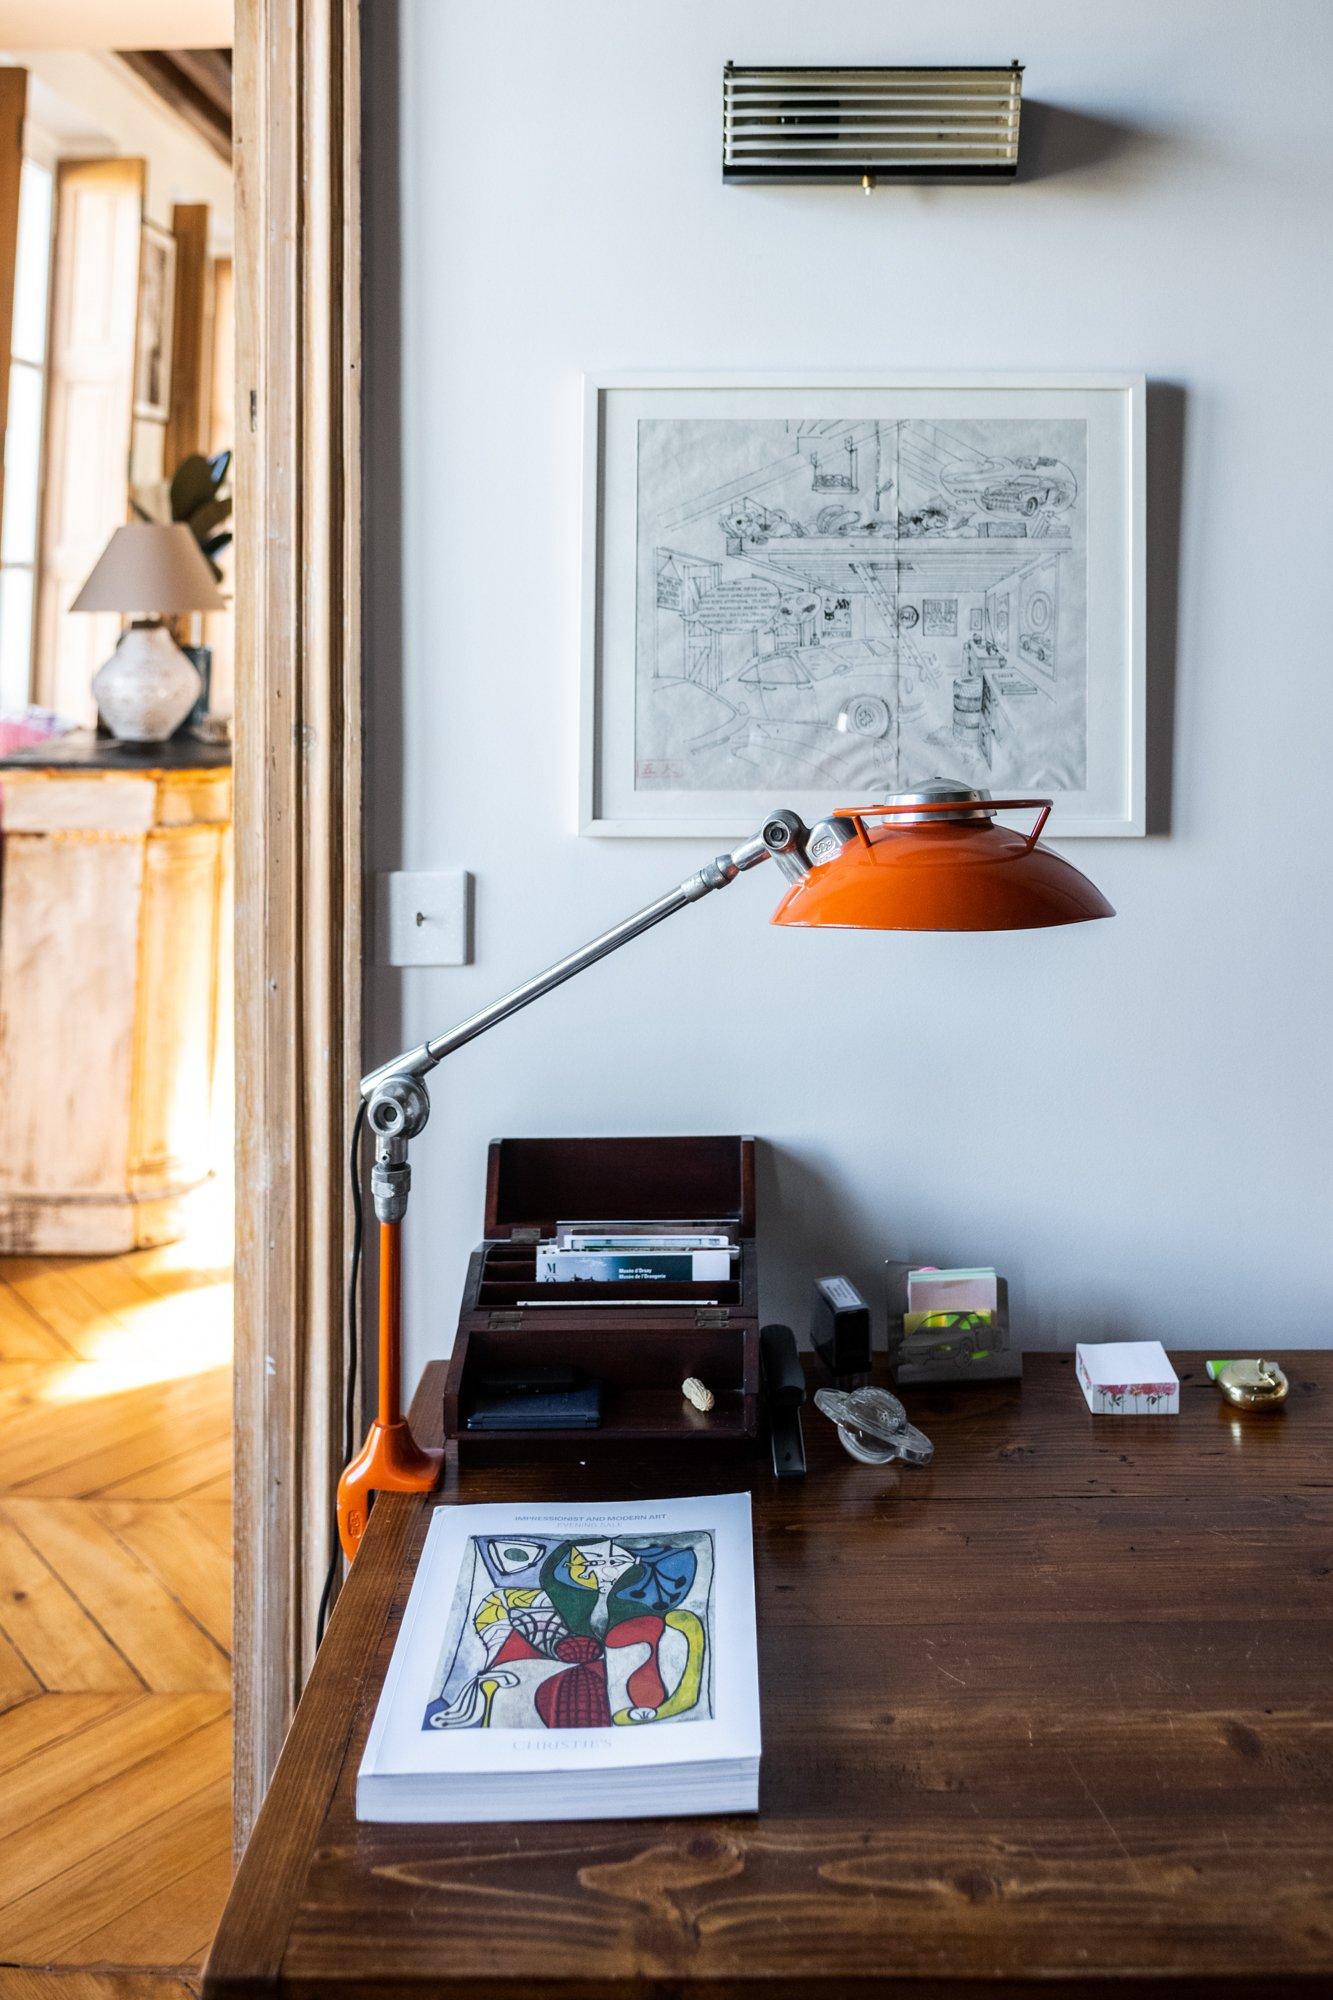 Bureau Appartement Famille Co-fondatrice Wilo & Grove Fanny Saulay et Thomas Seydoux